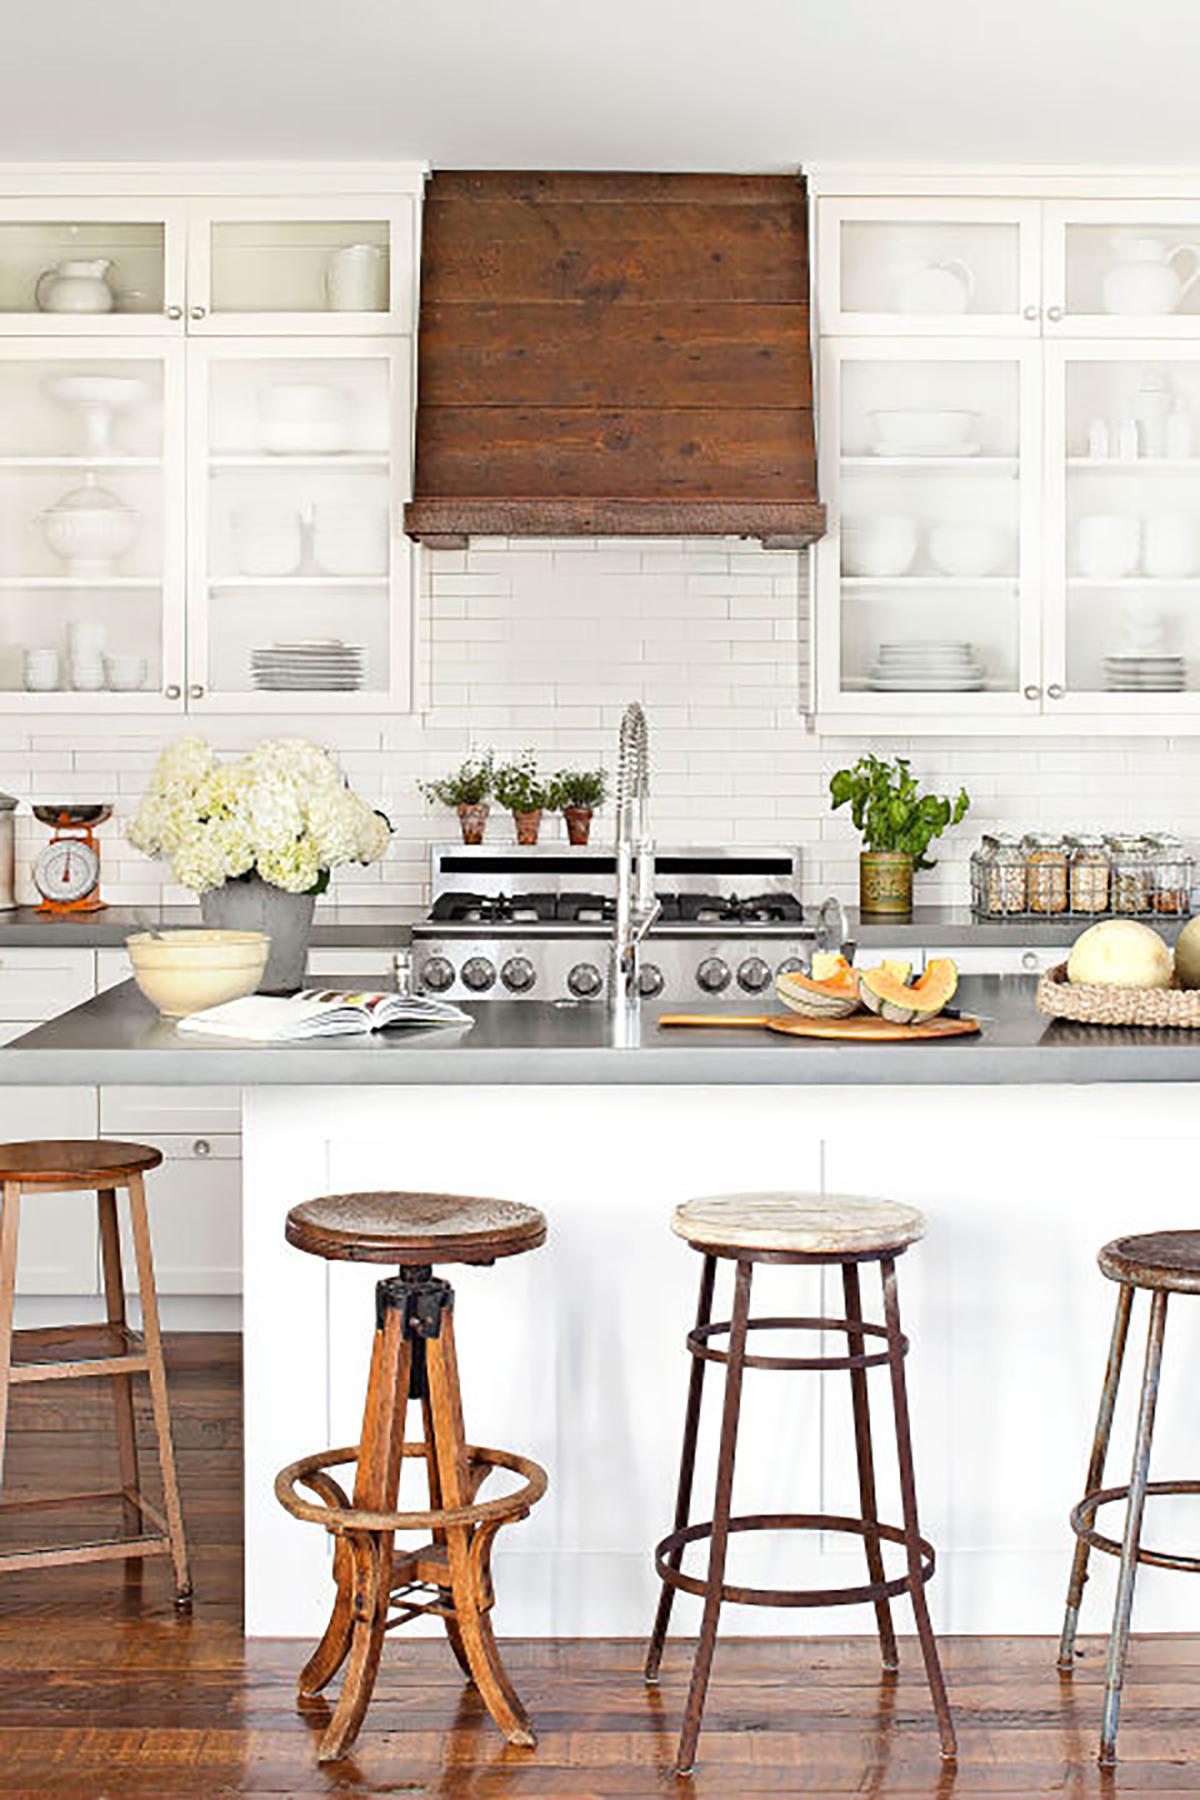 18 Farmhouse Style Kitchens - Rustic Decor Ideas for Kitchens on Farmhouse Kitchen Ideas  id=60420